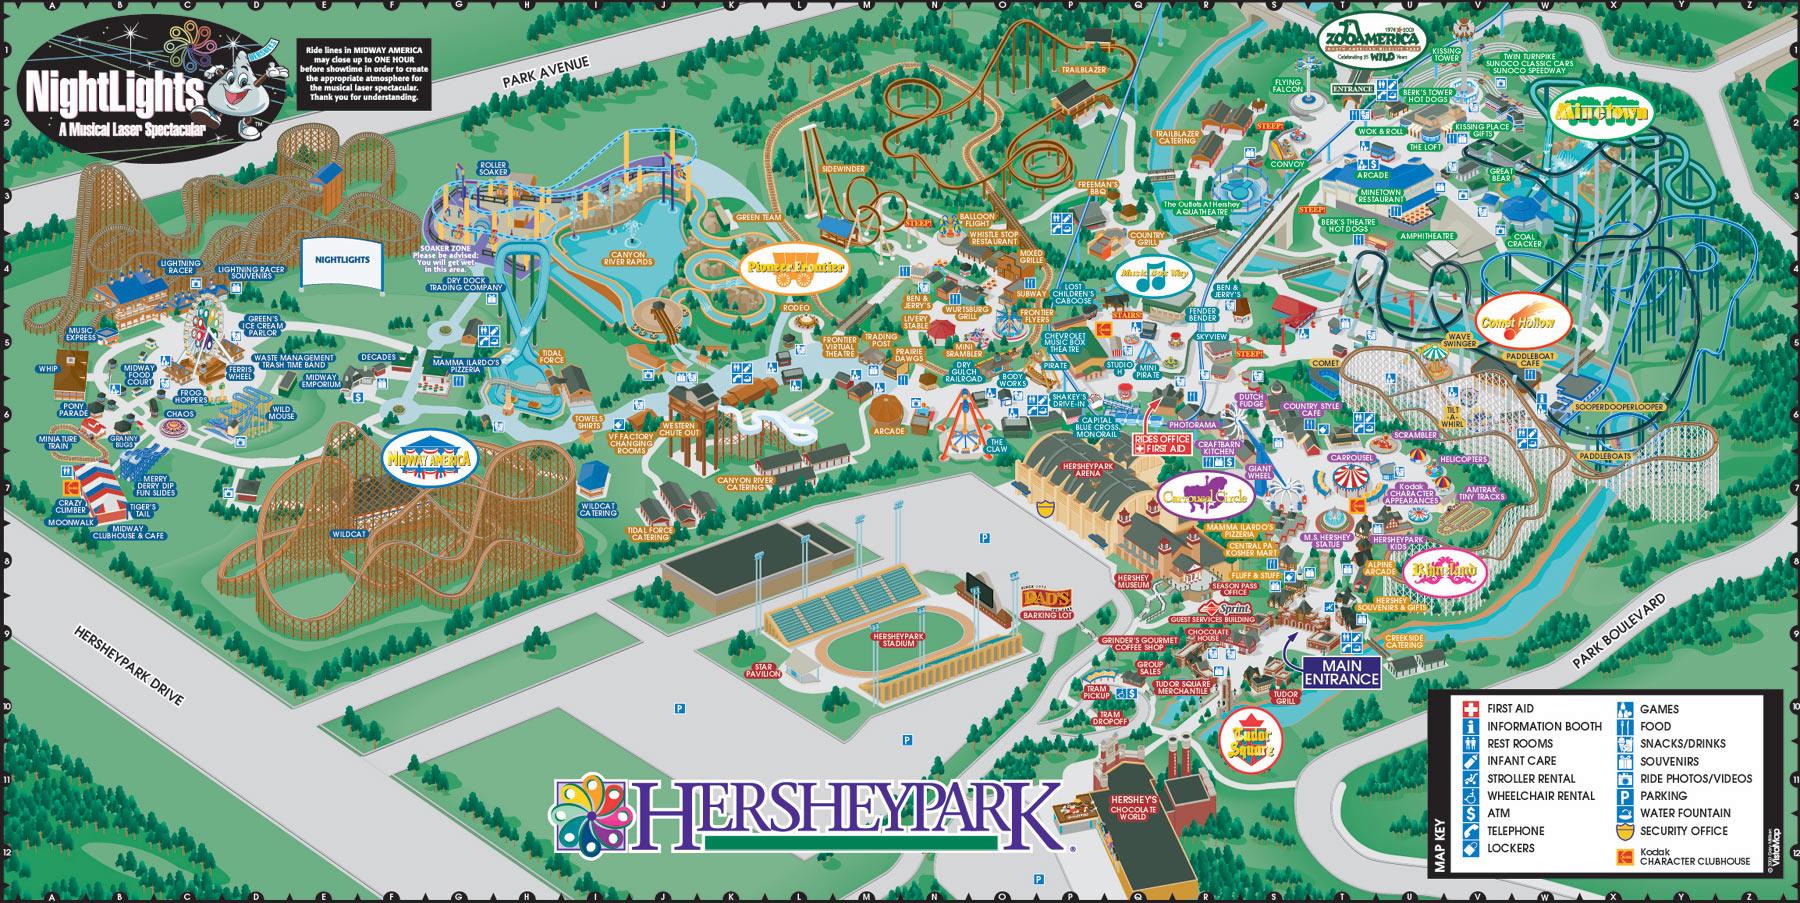 Hersheypark and Food Allergies